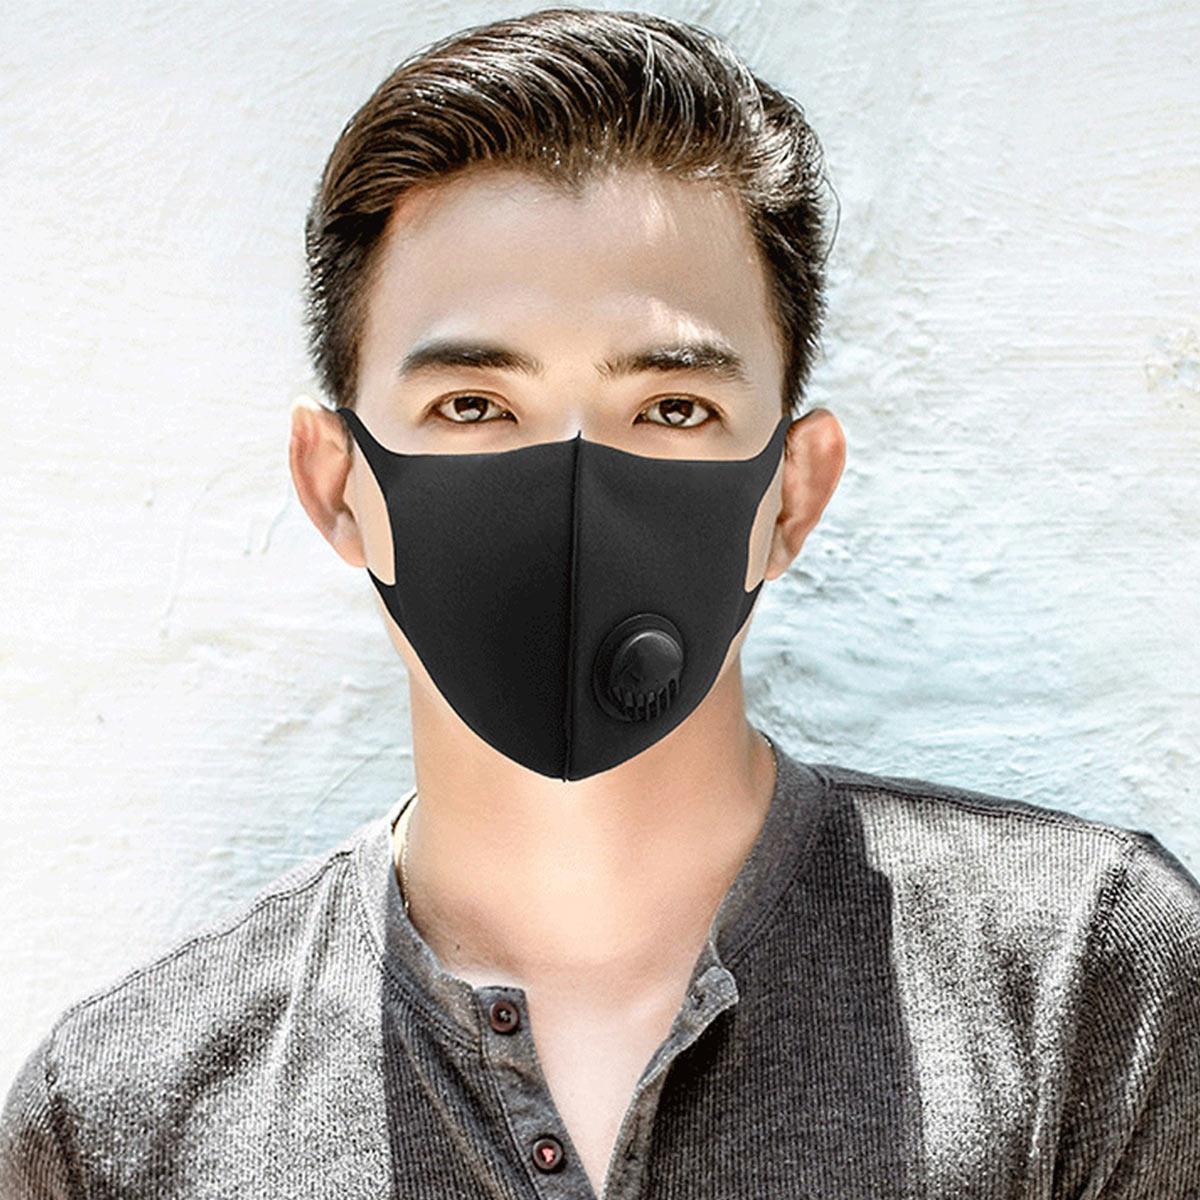 Cotton Dust-proof Mask Cycling Face Mask Unisex PM2.5 Washable Reusable Mask Breathable Mask Black Breathing Valve Mask FFP2